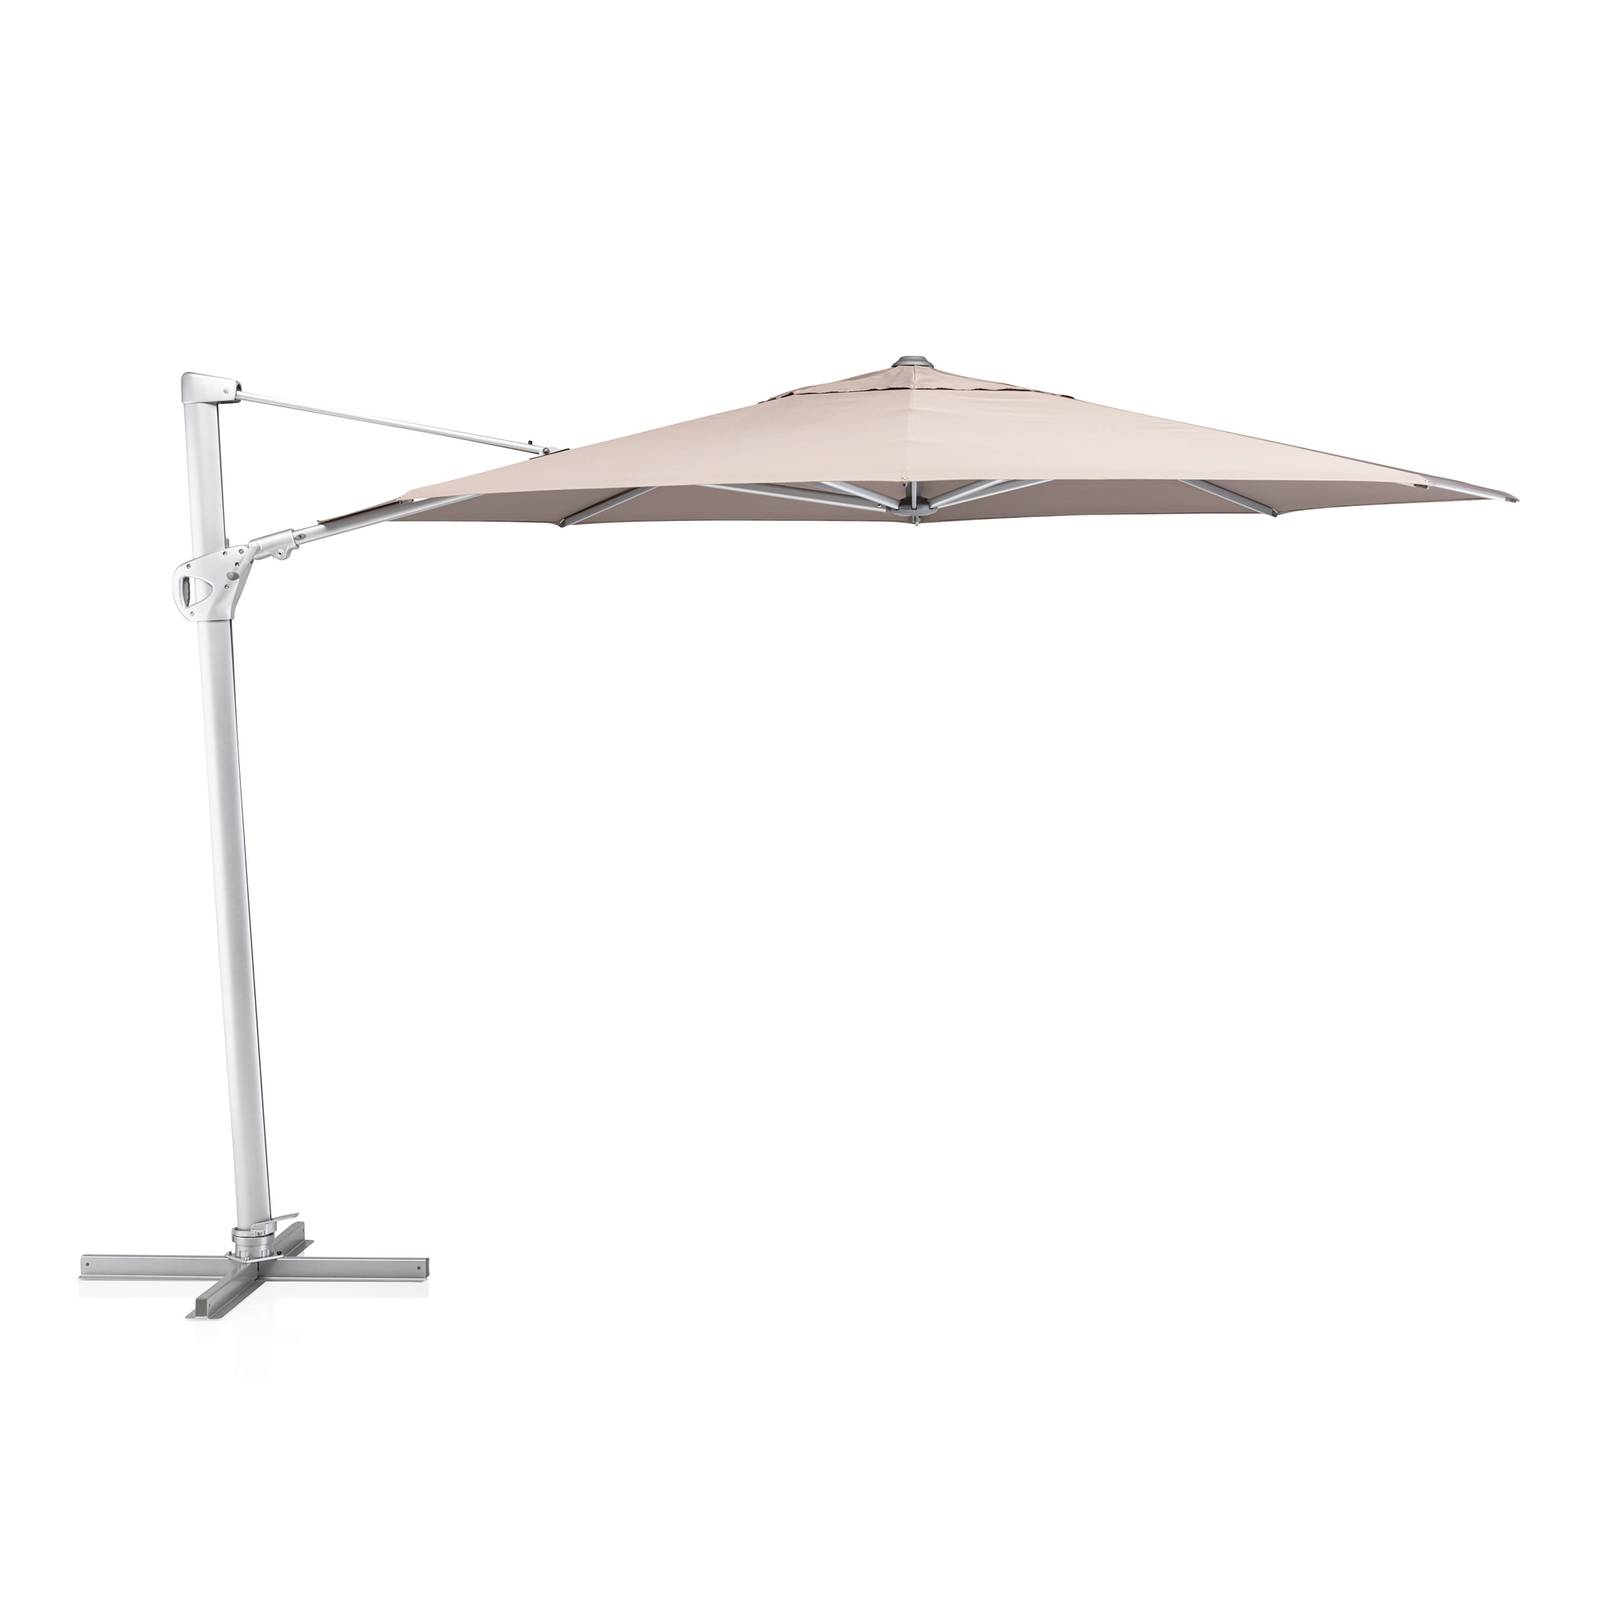 Parasol ogrodowy Easy Swing 3,5 m srebrny / taupe KETTLER